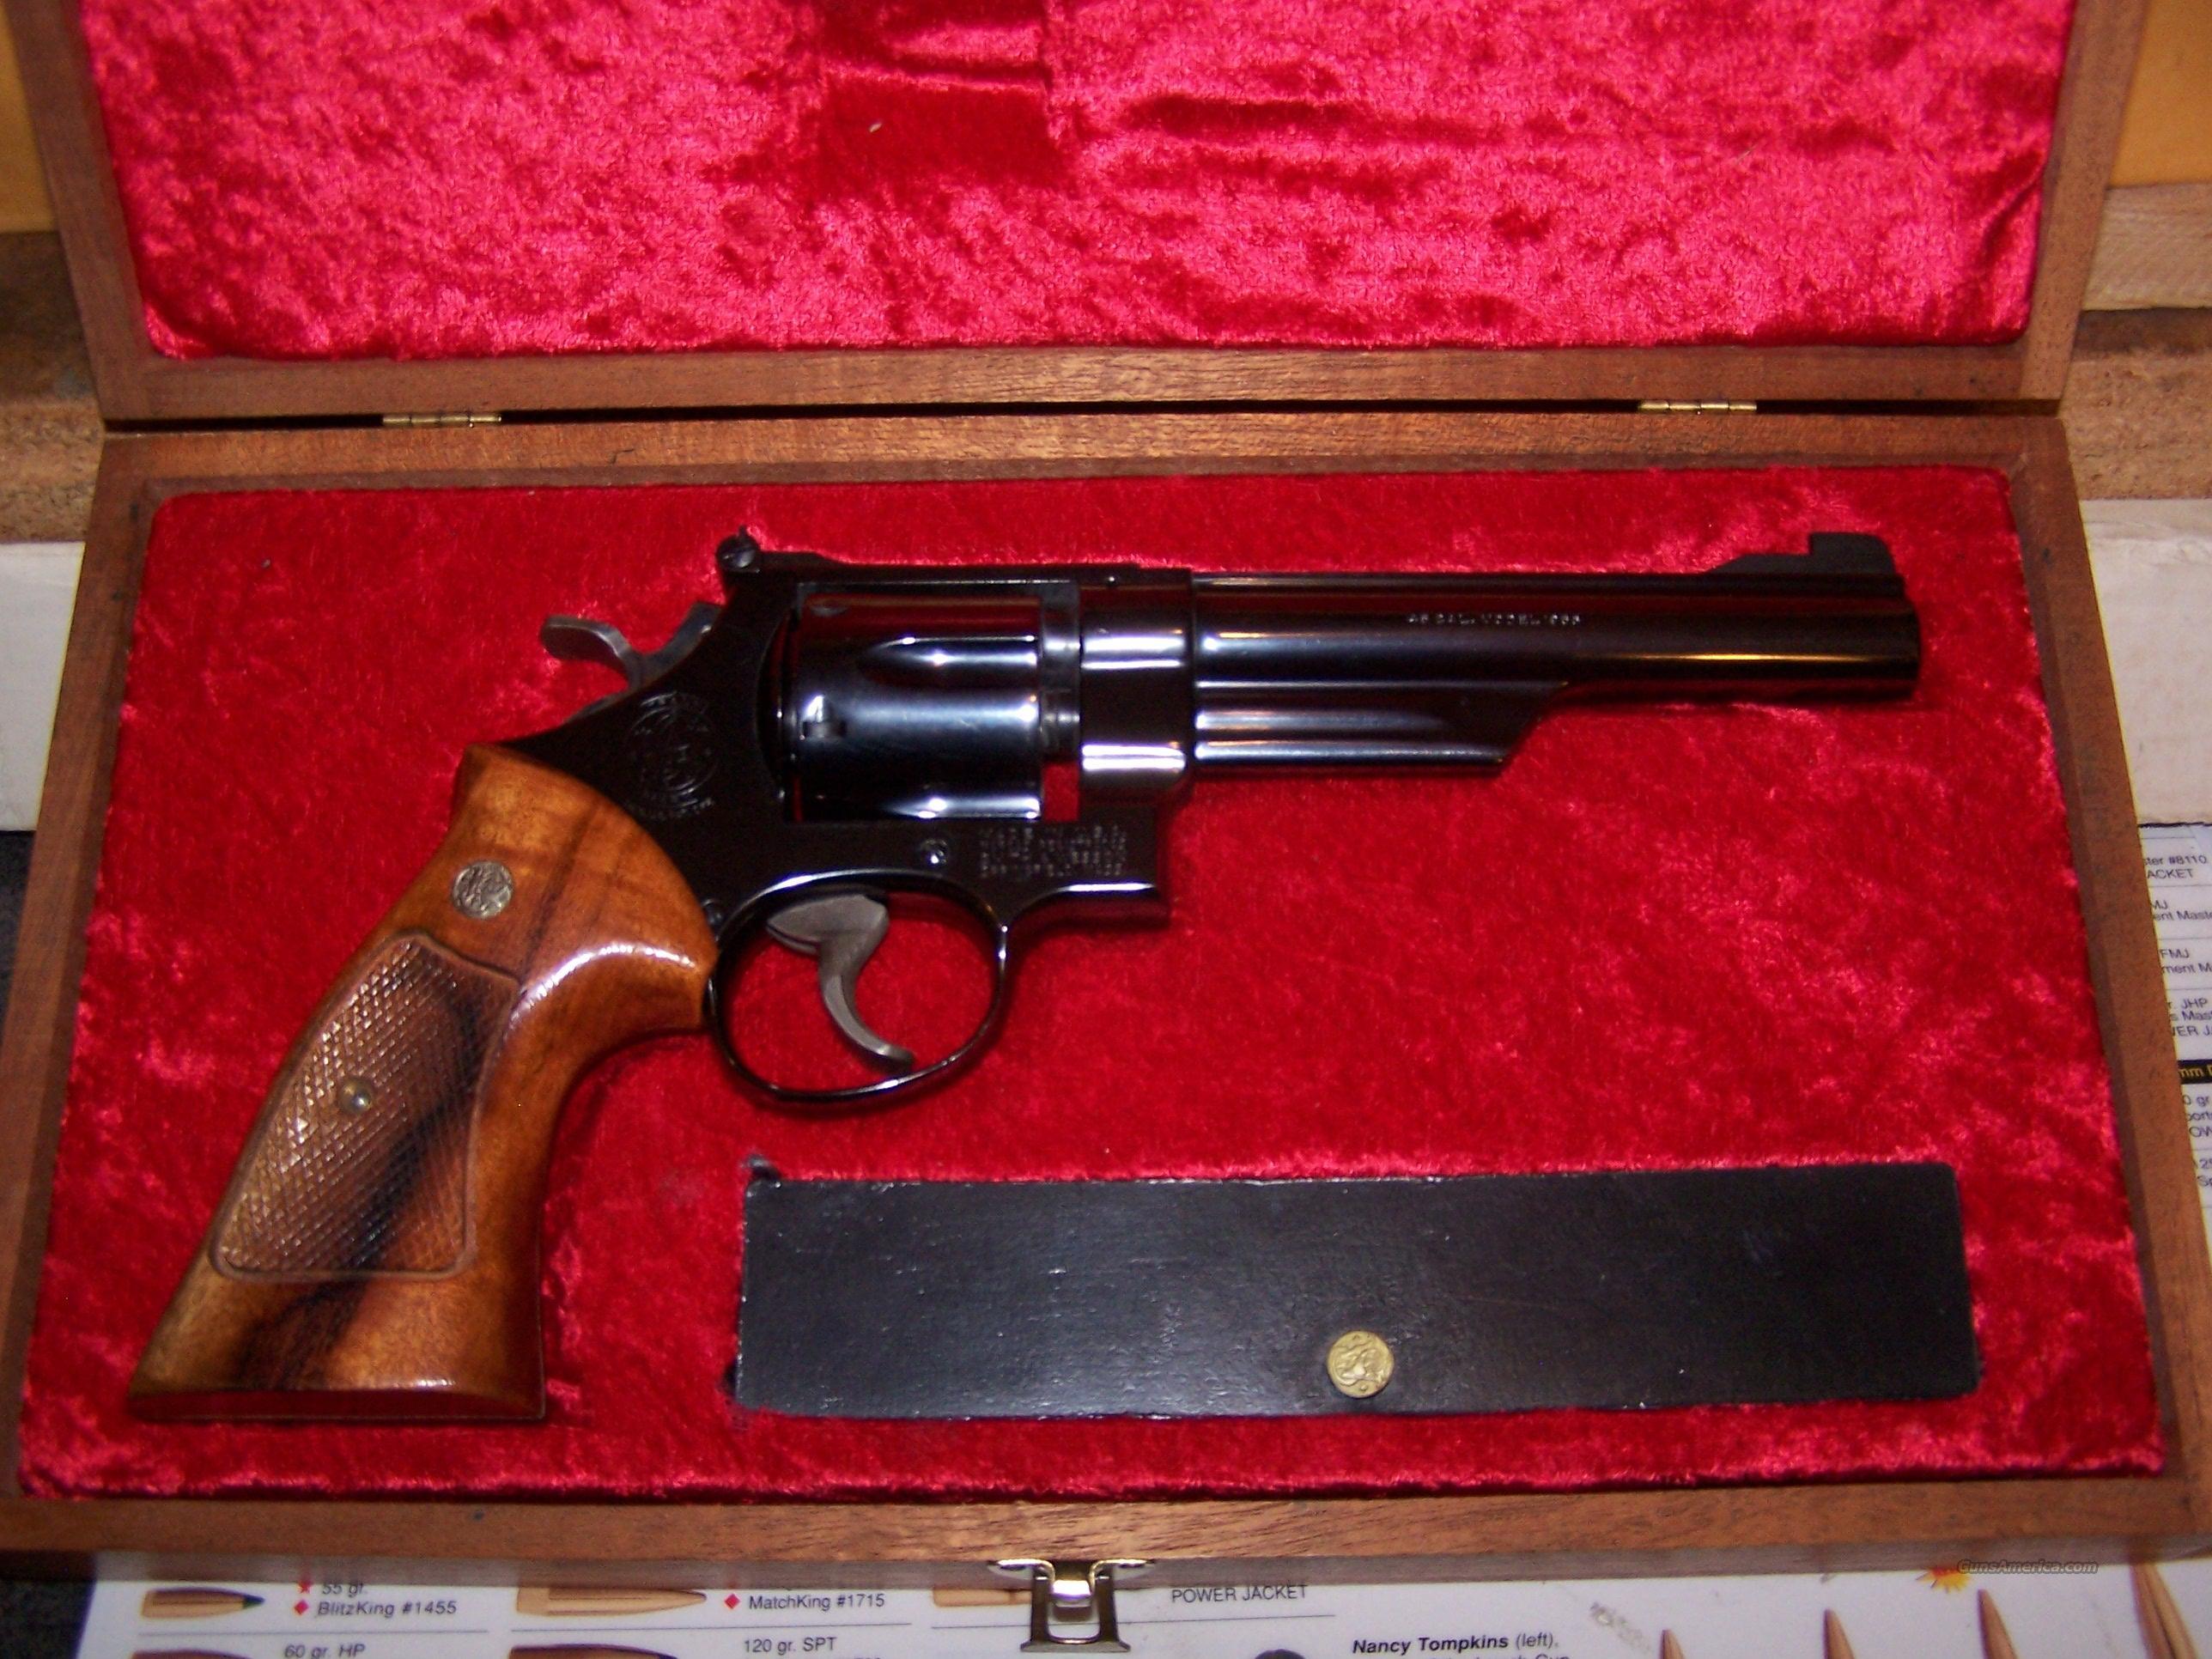 Smith & Wesson  25-2, Model 1955  Guns > Pistols > Smith & Wesson Revolvers > Full Frame Revolver